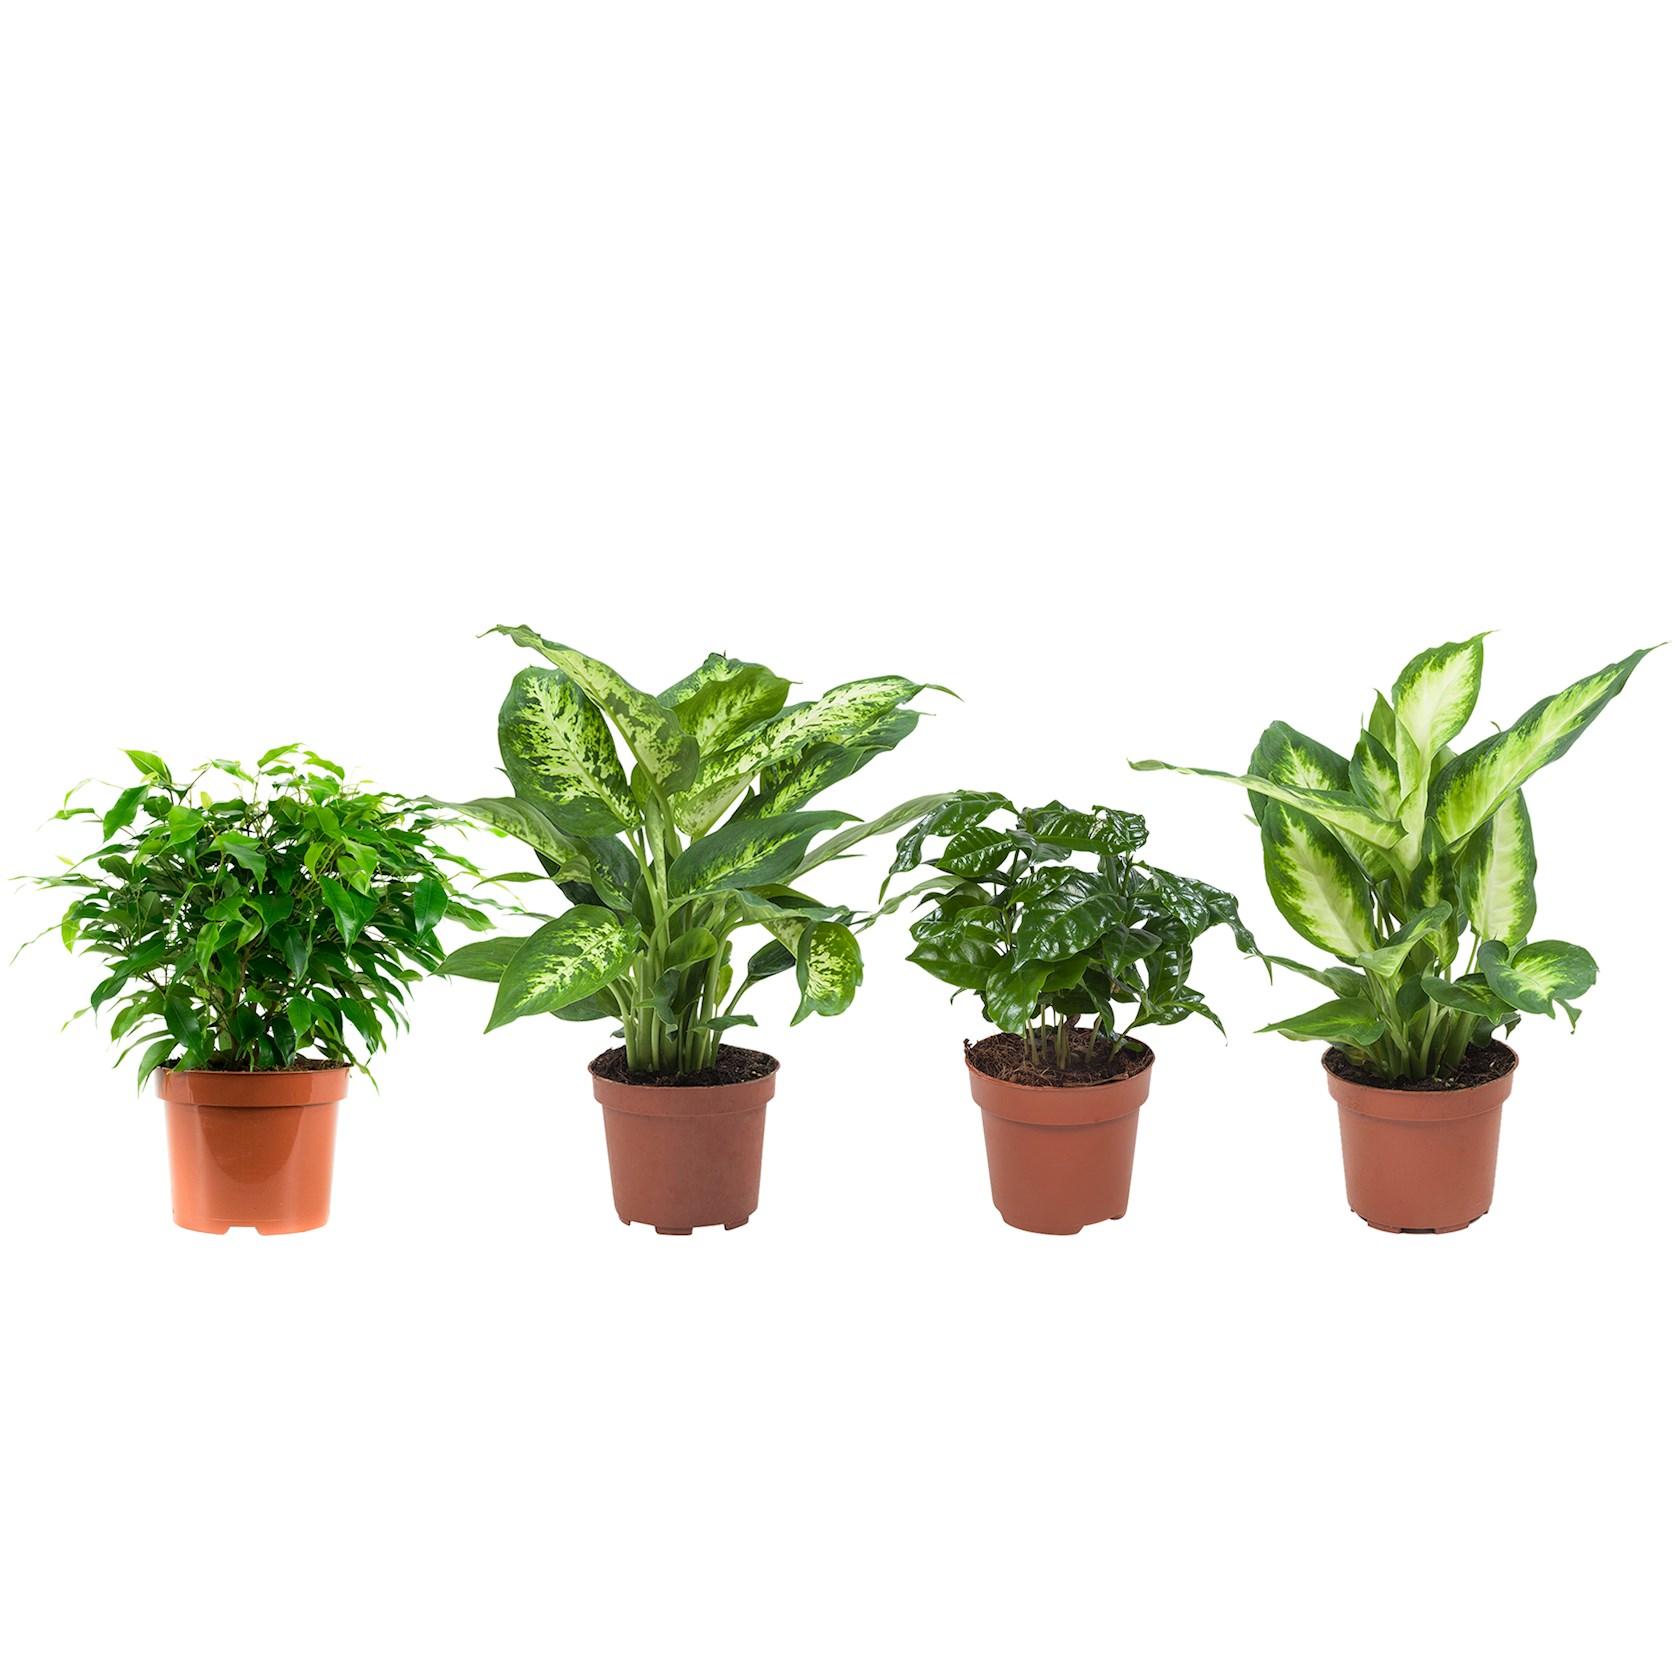 4 stuks Ficus (Ficus Green Kinky), Koffieplant (Coffea Arabica), Dieffenbachia (Dieffenbachia Compacta), Dieffenbachia (Dieffenbachia Camilla) - pot 12cm - hoogte 25cm